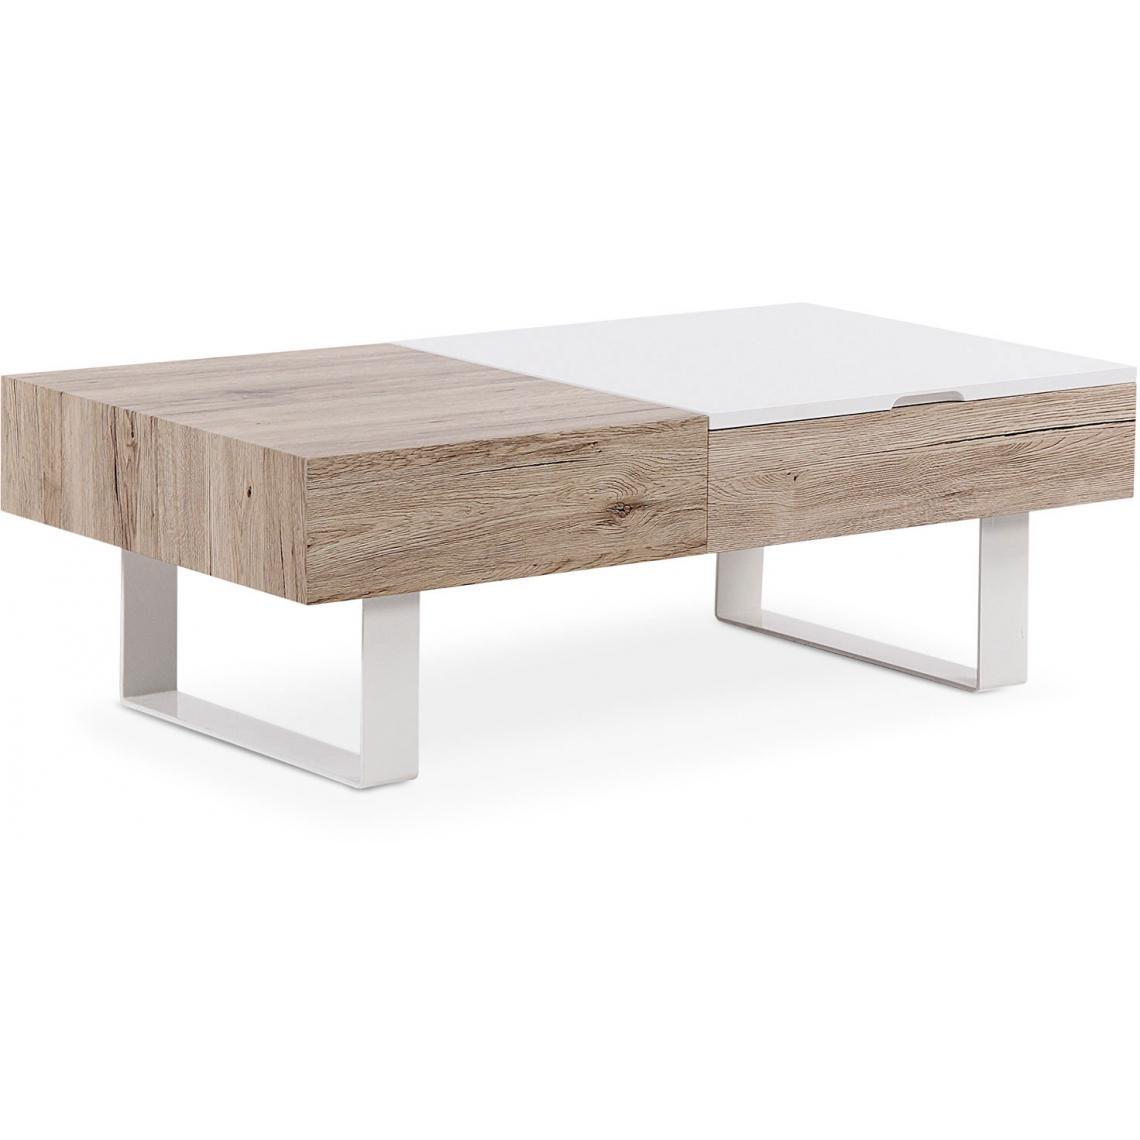 Table Basse Relevable En Chene Clair Jolly 3 Suisses